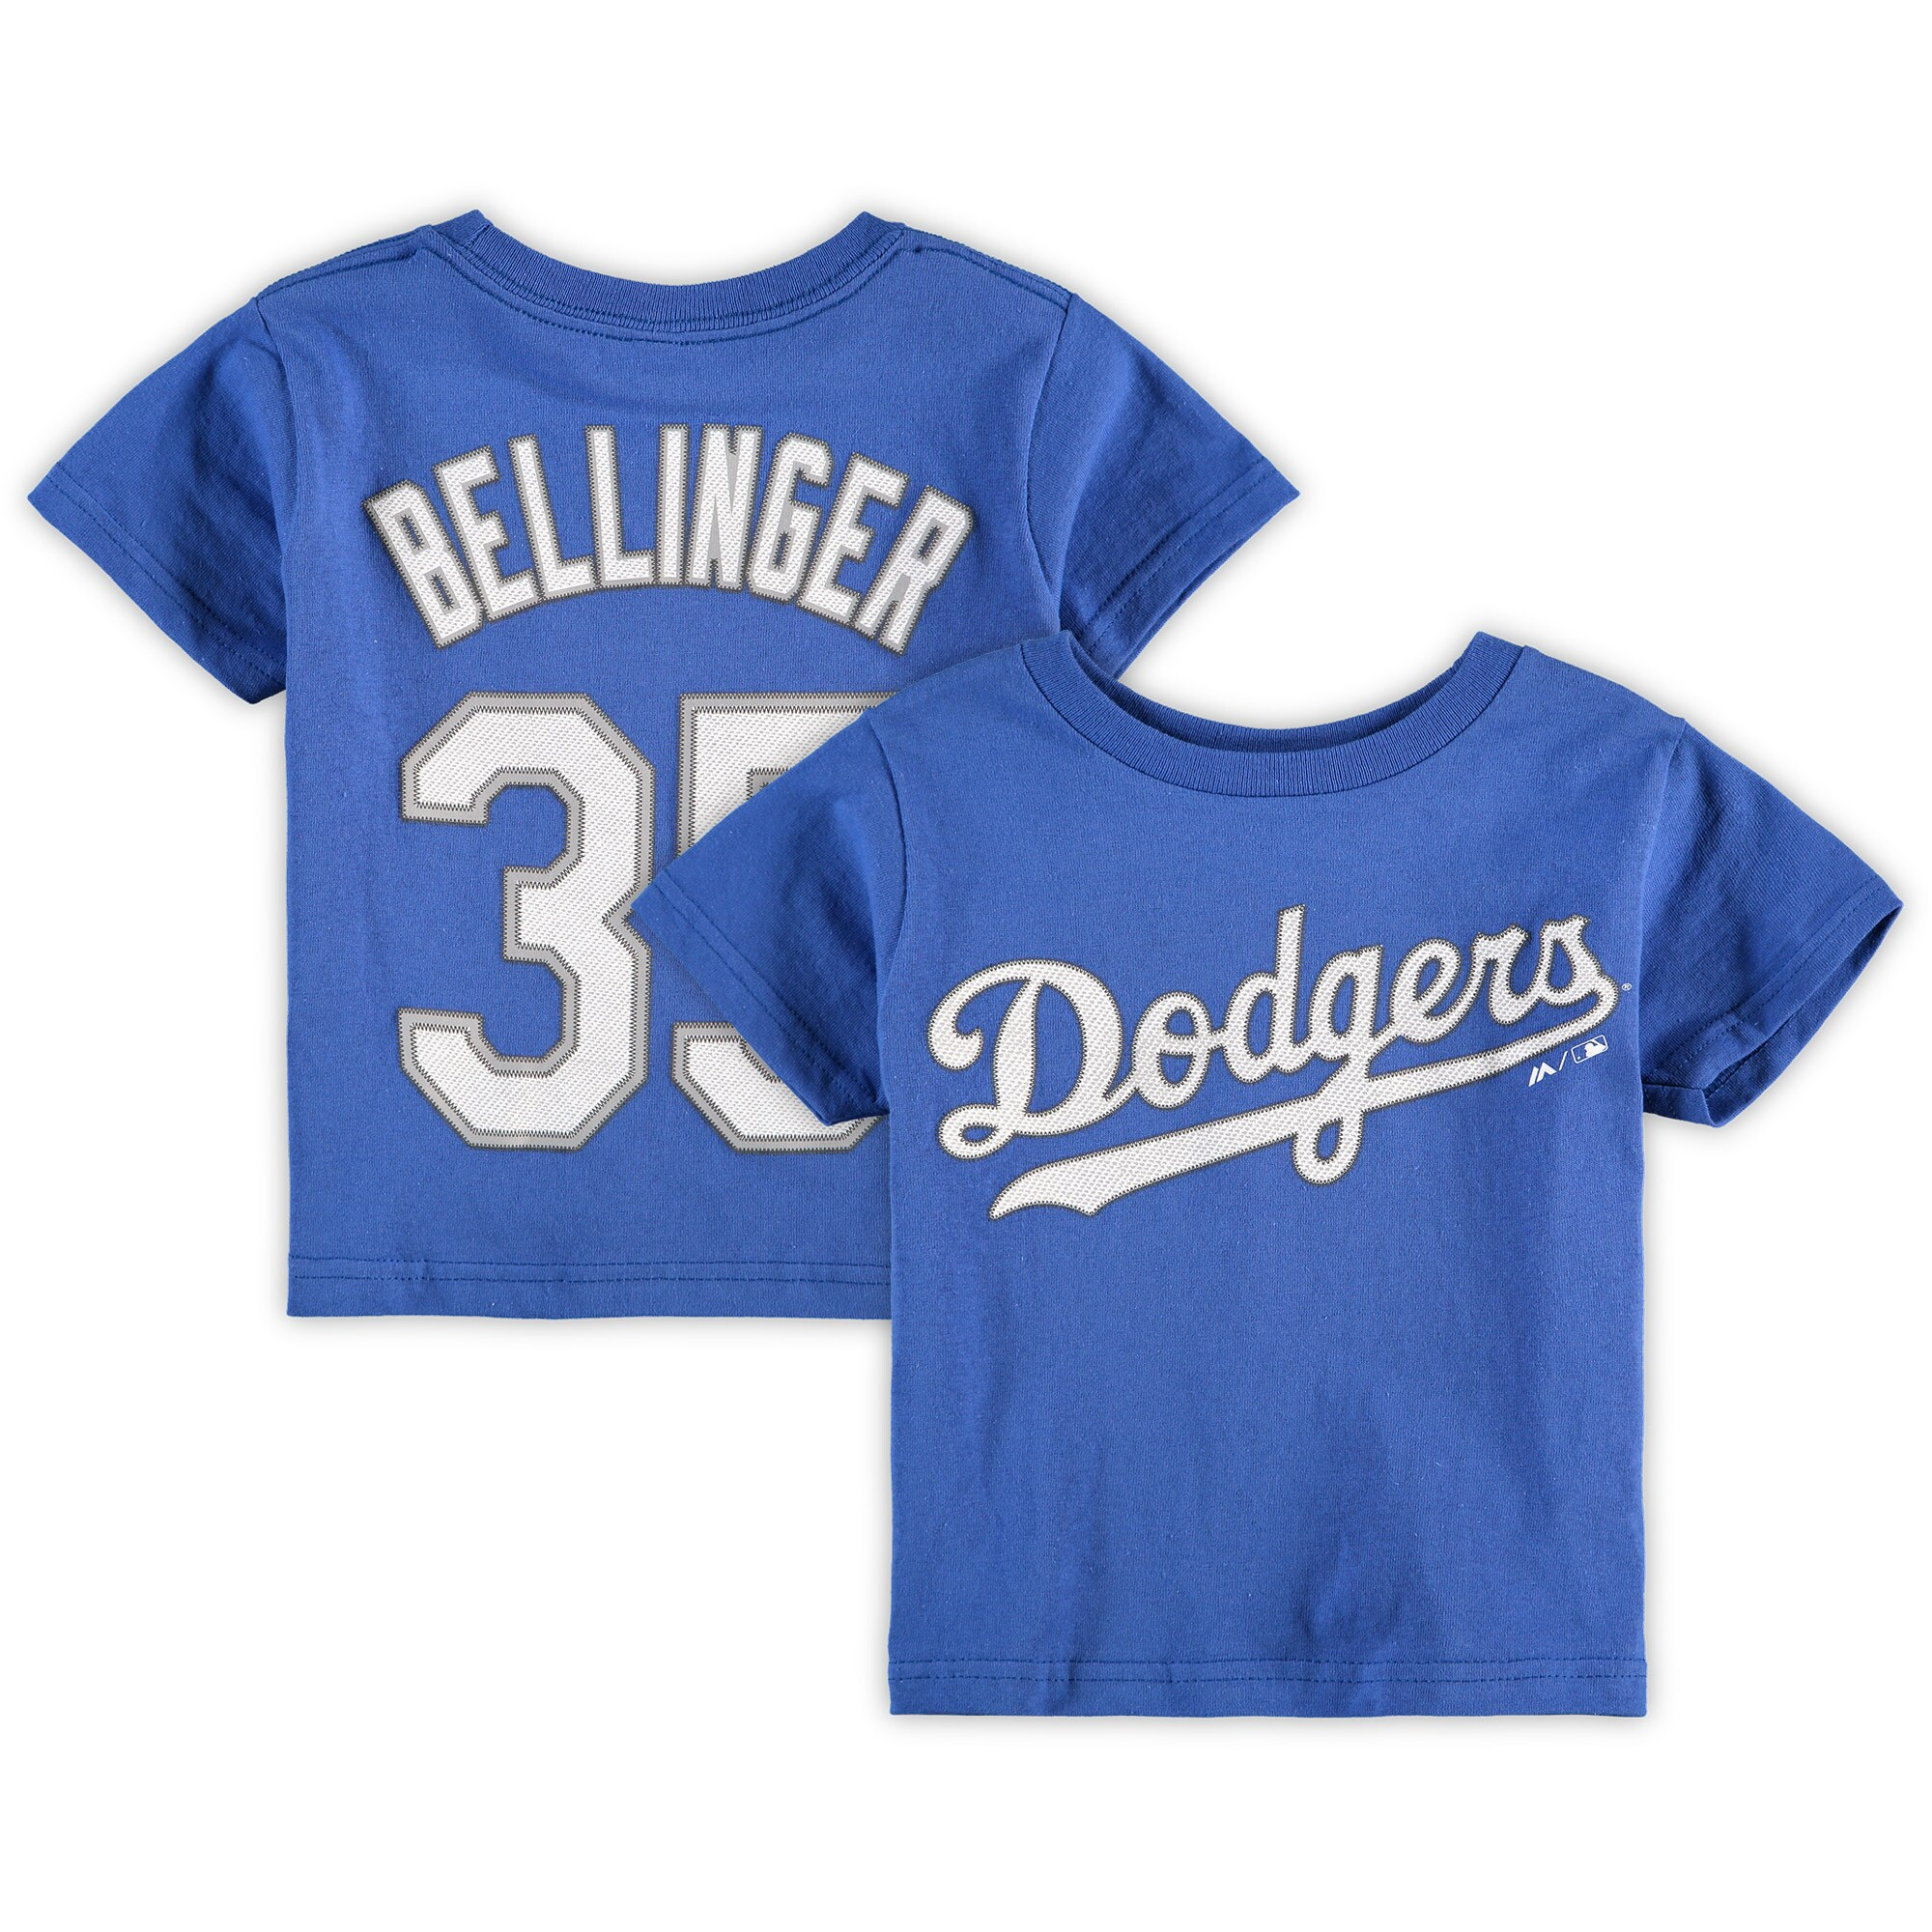 Cody Bellinger Los Angeles Dodgers Majestic Toddler Player Name & Number T-Shirt - Royal